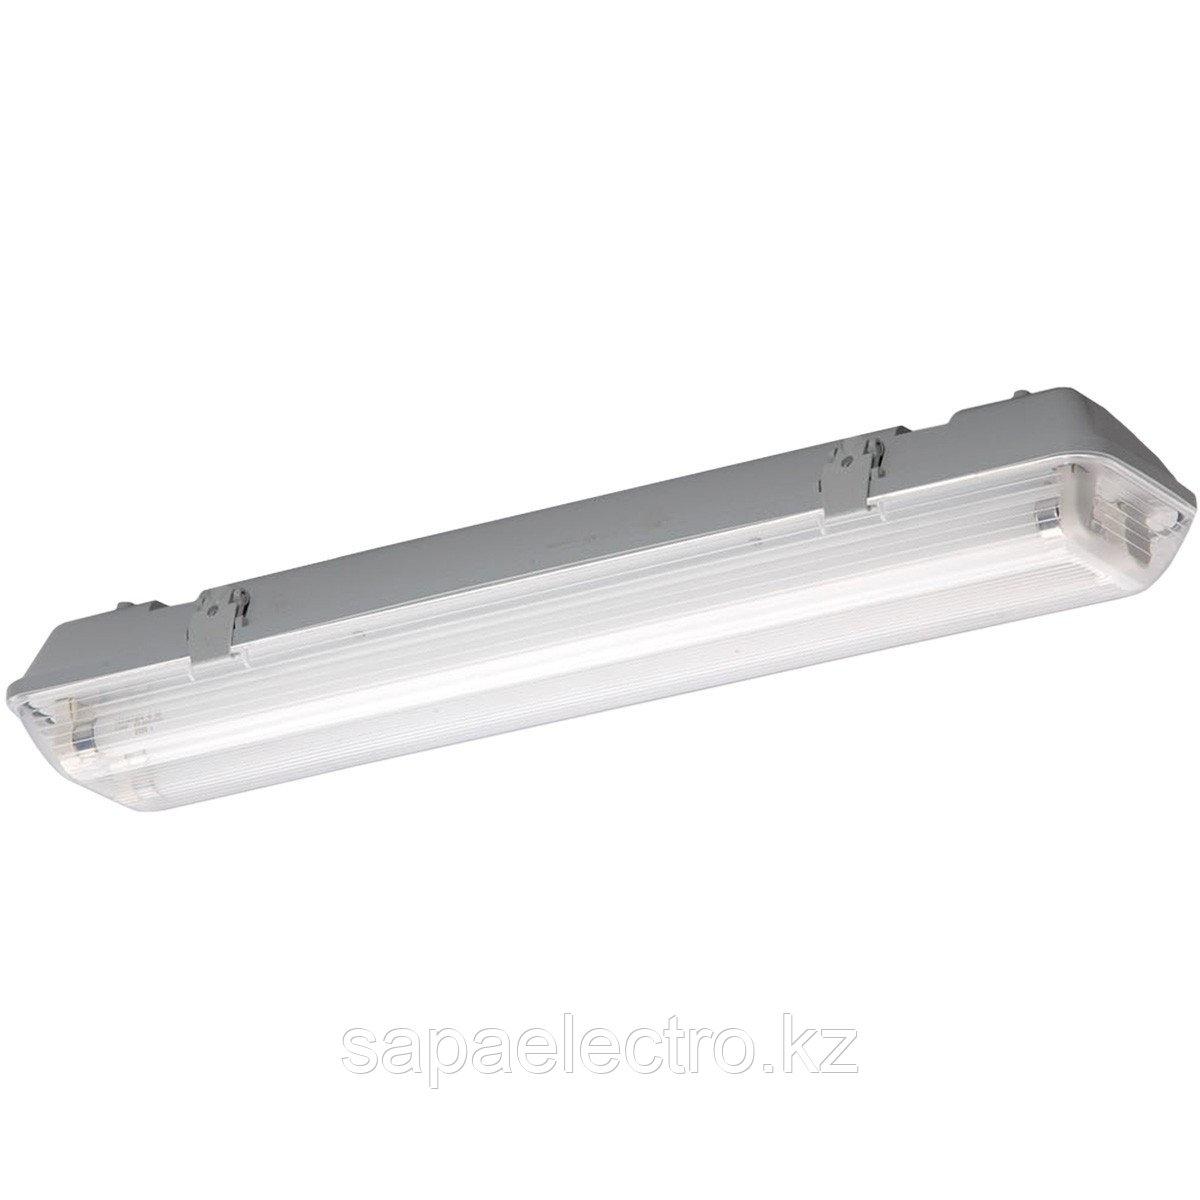 Св-к LEDTUBE LZG 2x18W +лампа (1.20см) MEGALUX